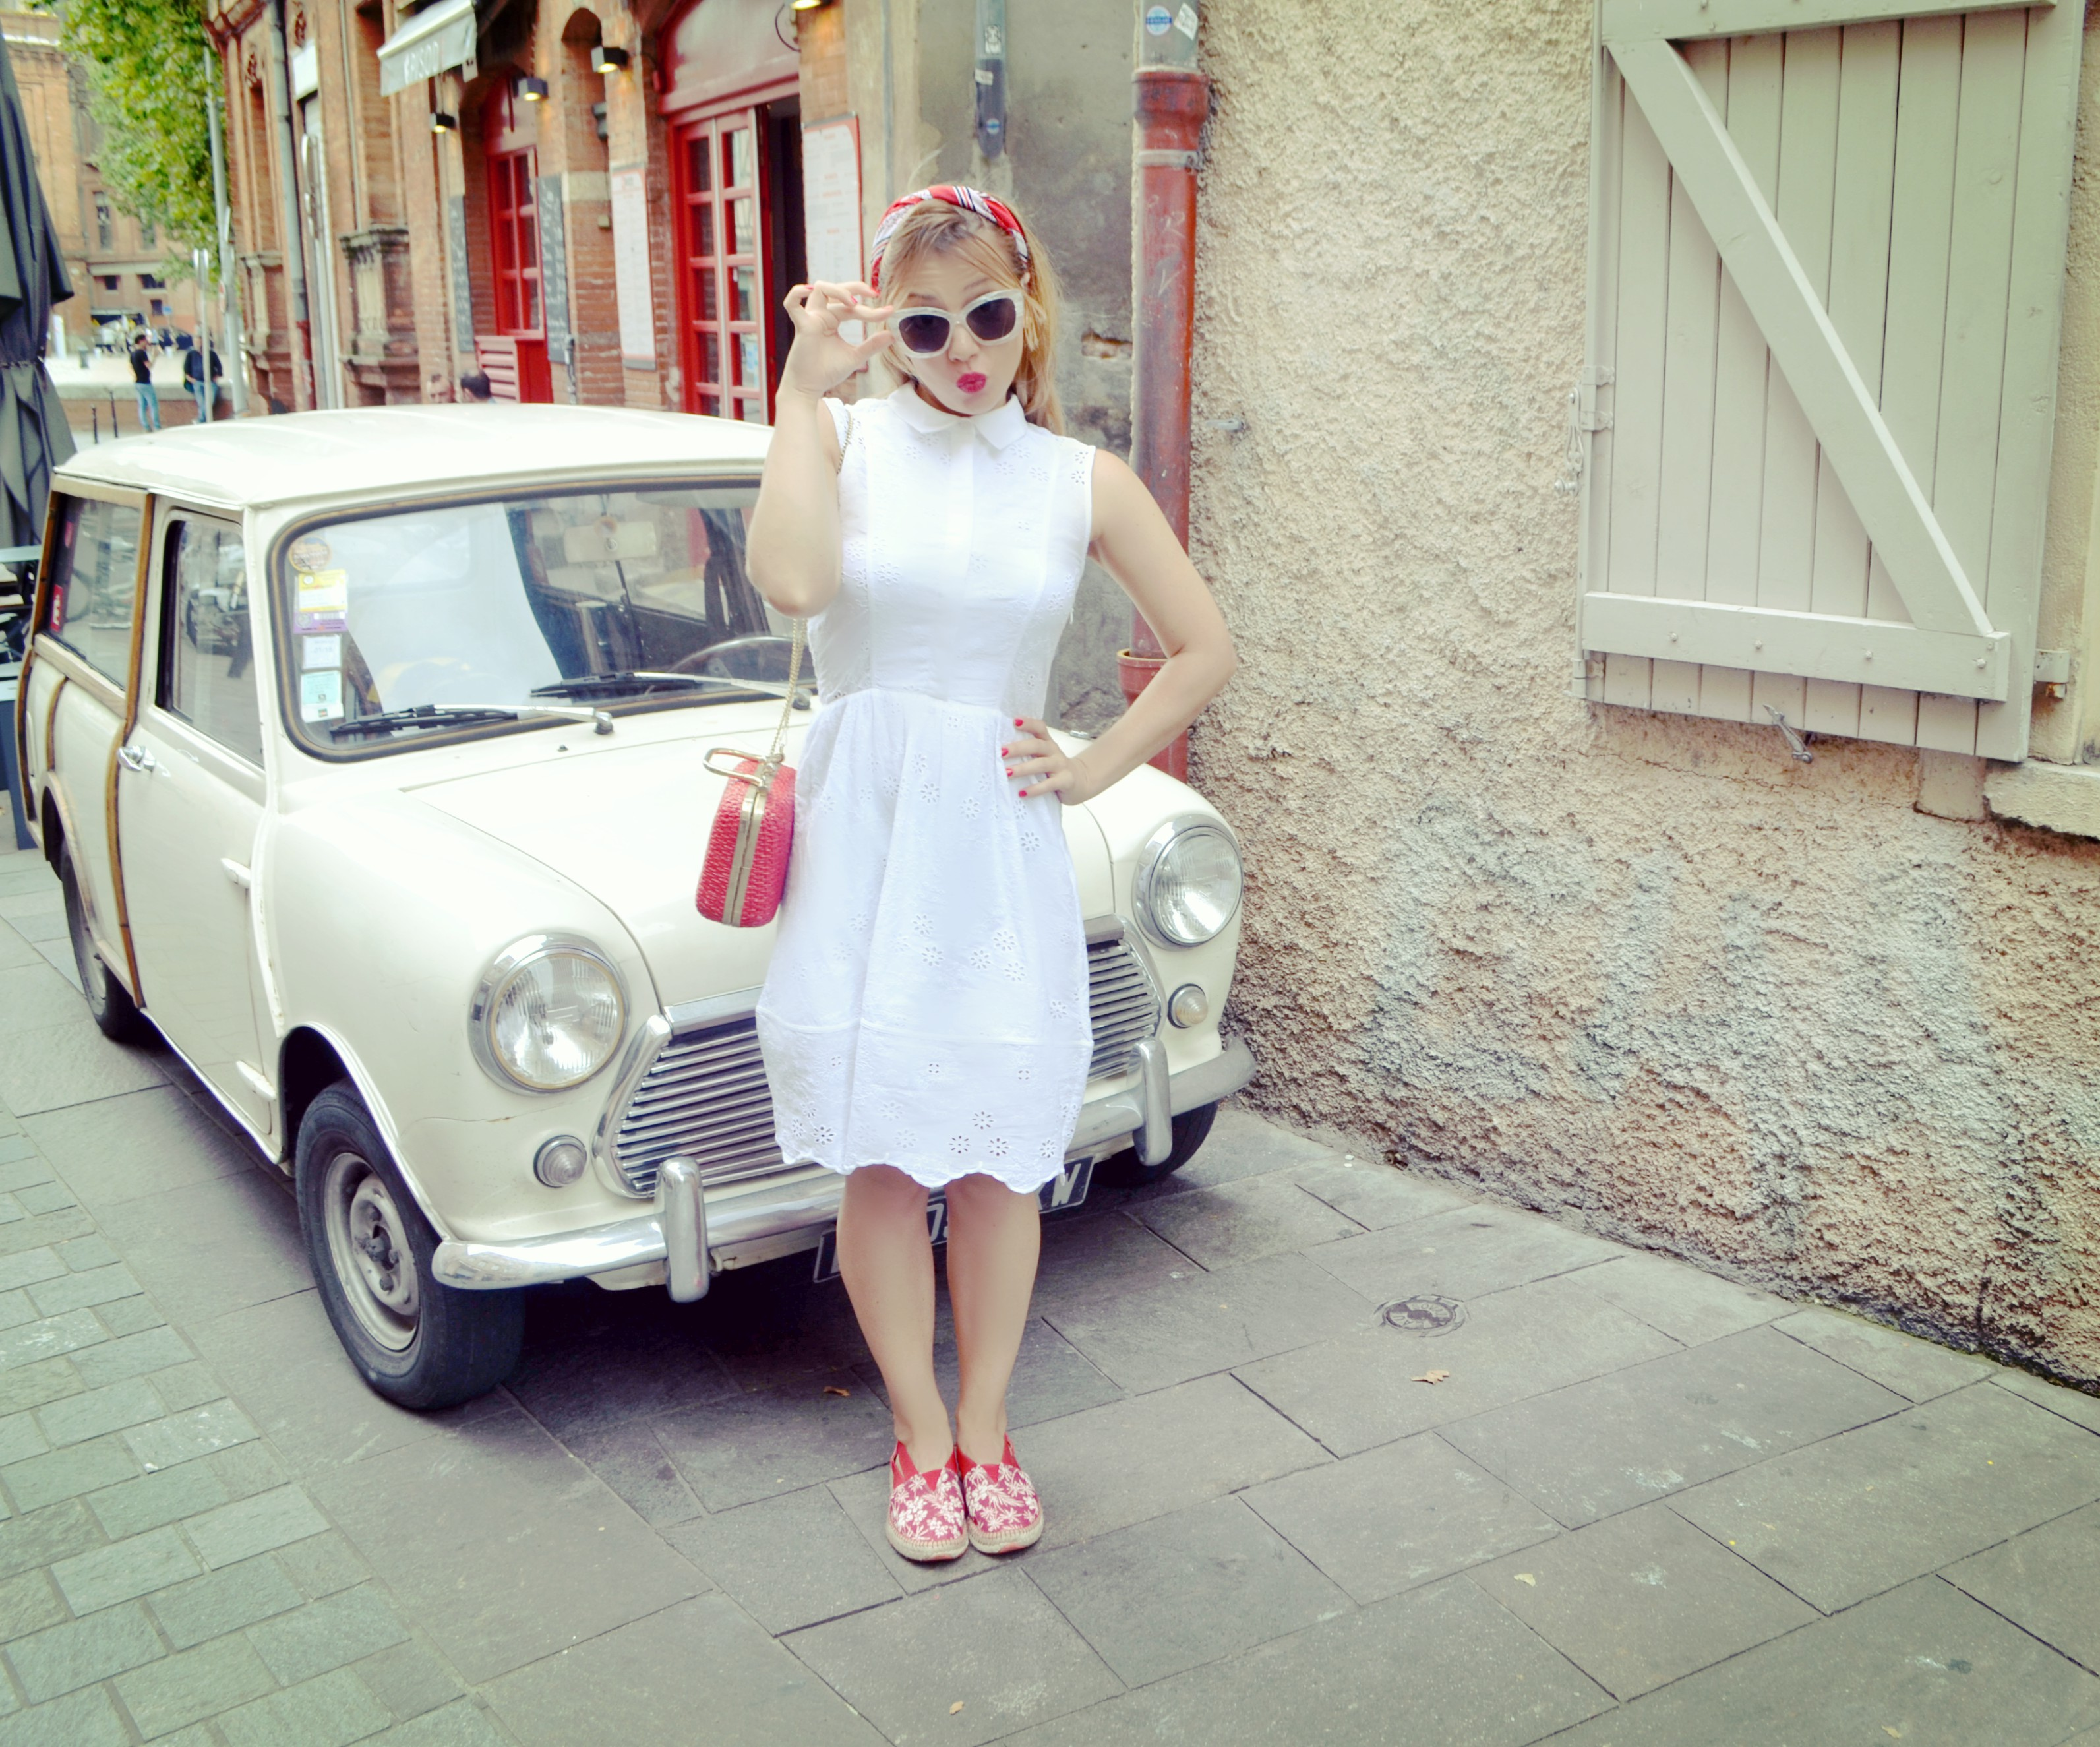 Blog-de-moda-vestidos-blancos-fashionista-Influencer-traveller-ChicAdicta-Toulouse-france-Chic-Adicta-instint-alpargatas-PiensaenChic-Piensa-en-Chic